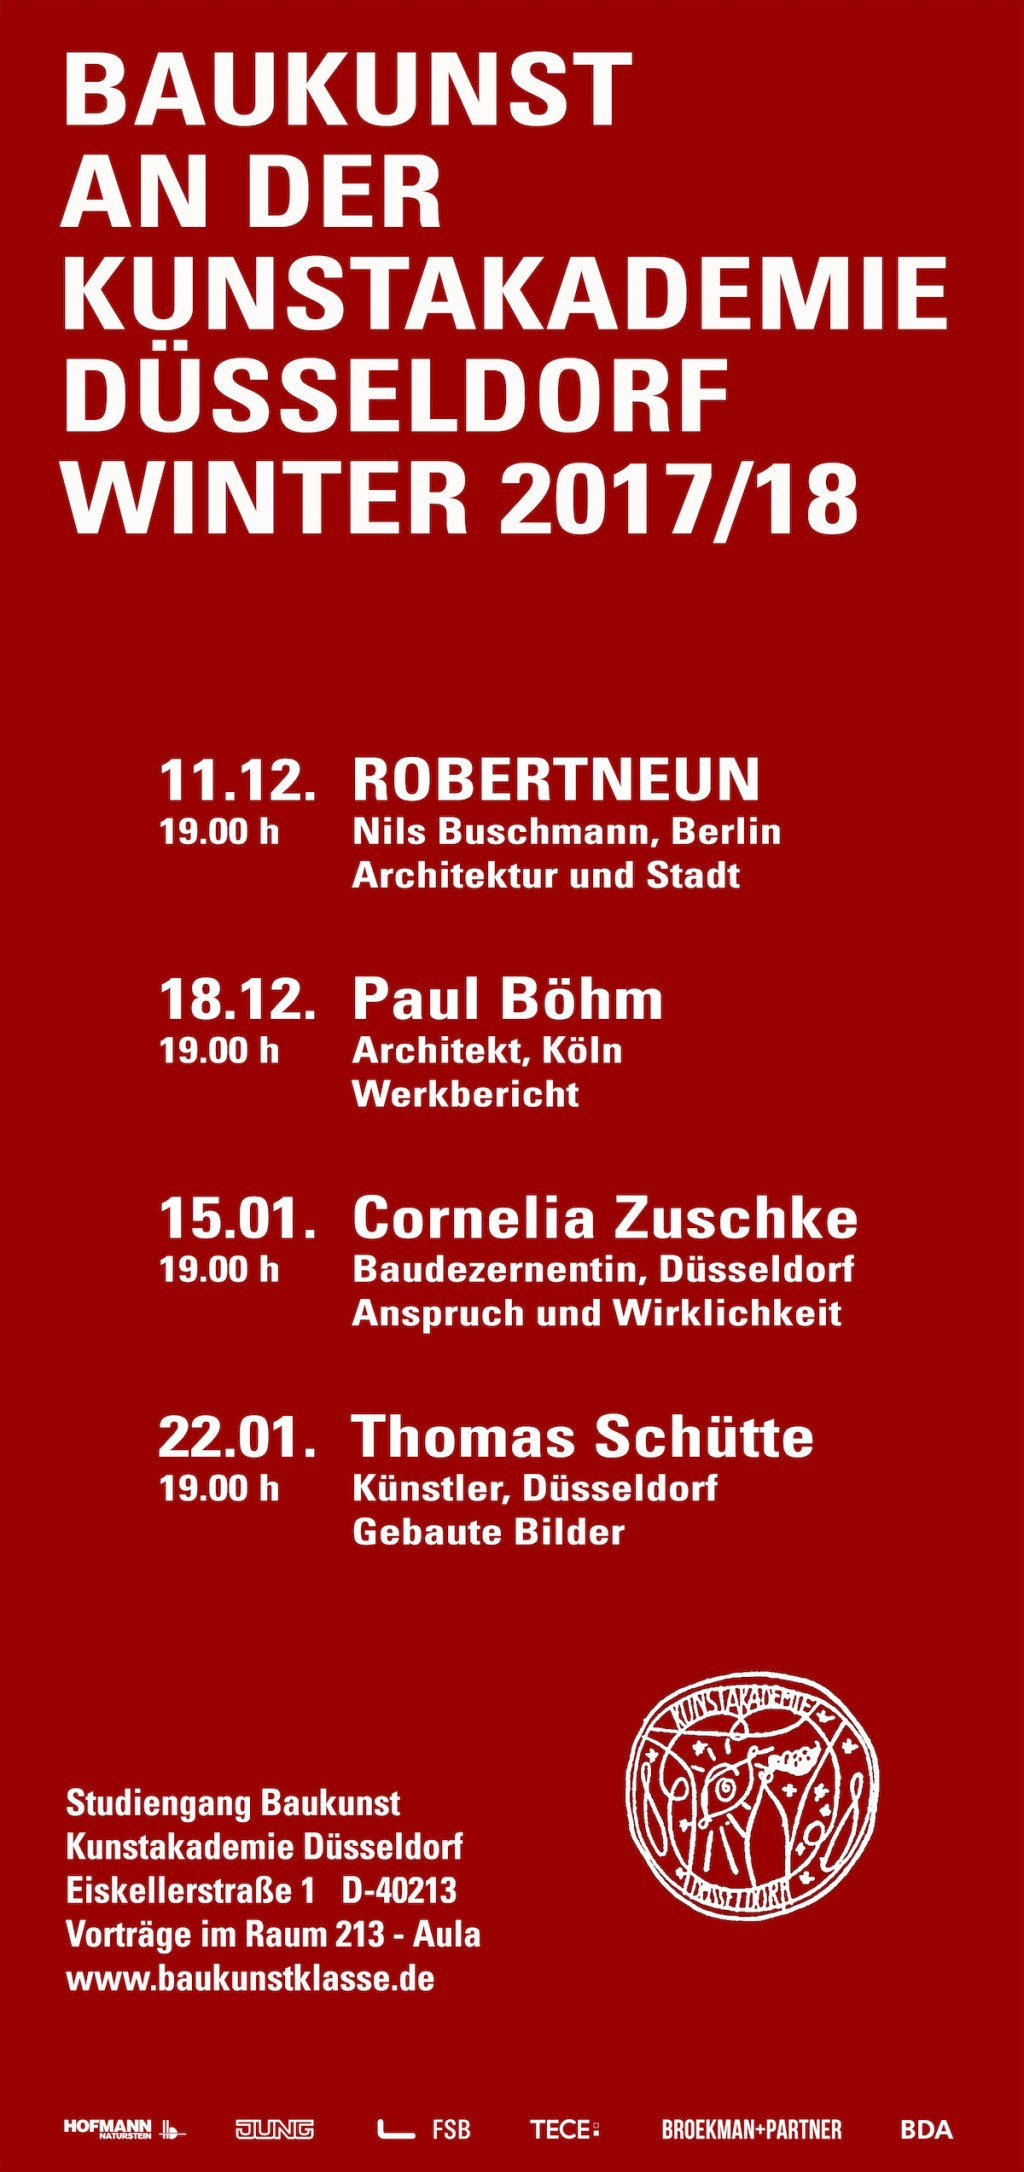 Broekman+Partner Baukunst Kunstakademie Düsseldorf Wintersemester 2017/18